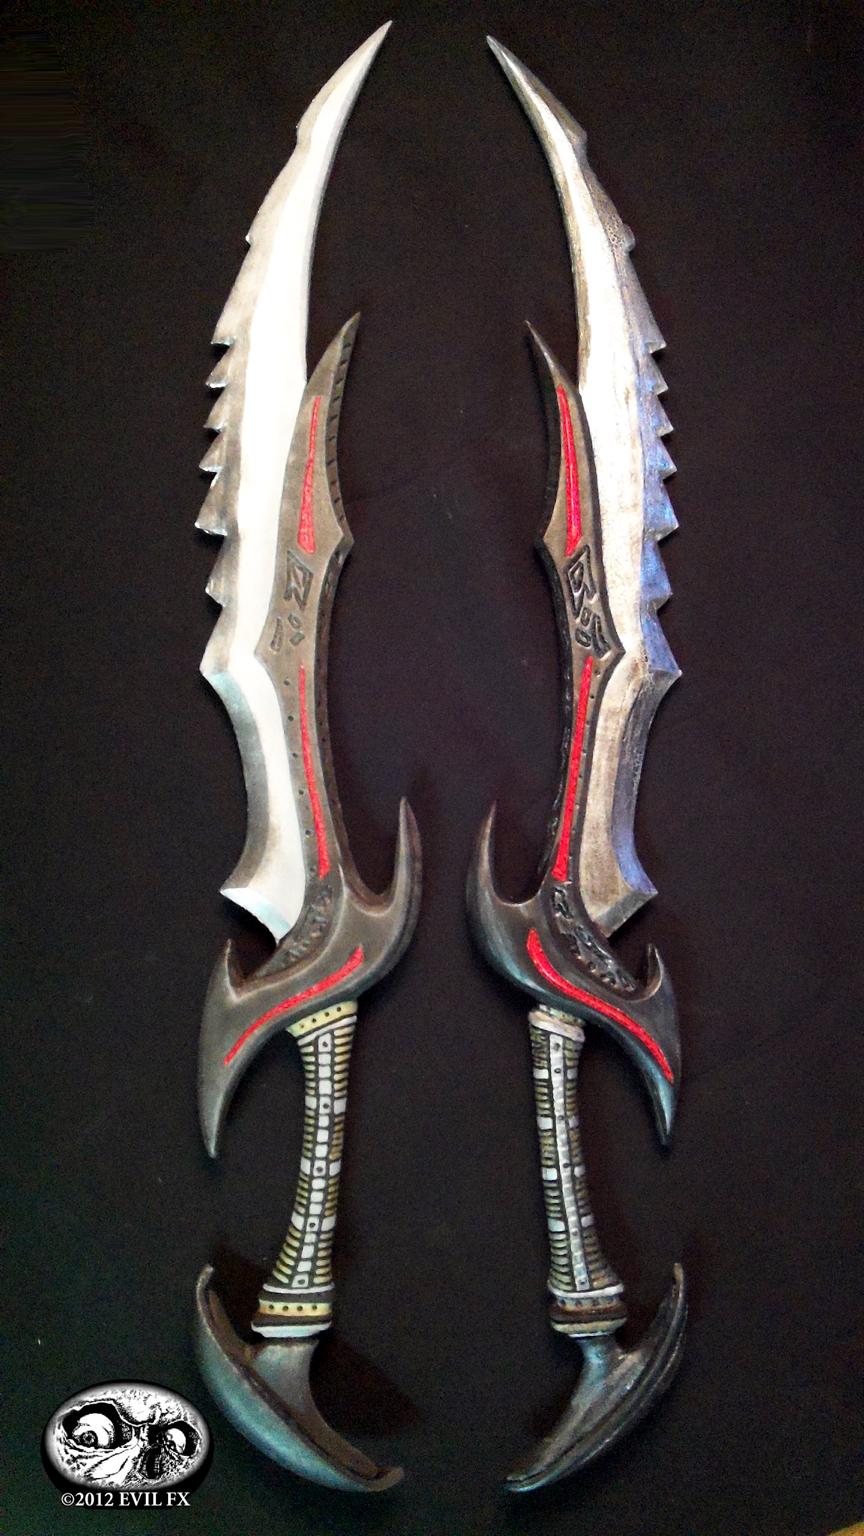 skyrim_daedric_swords_2_by_evil_fx-d4ni5xi.jpg